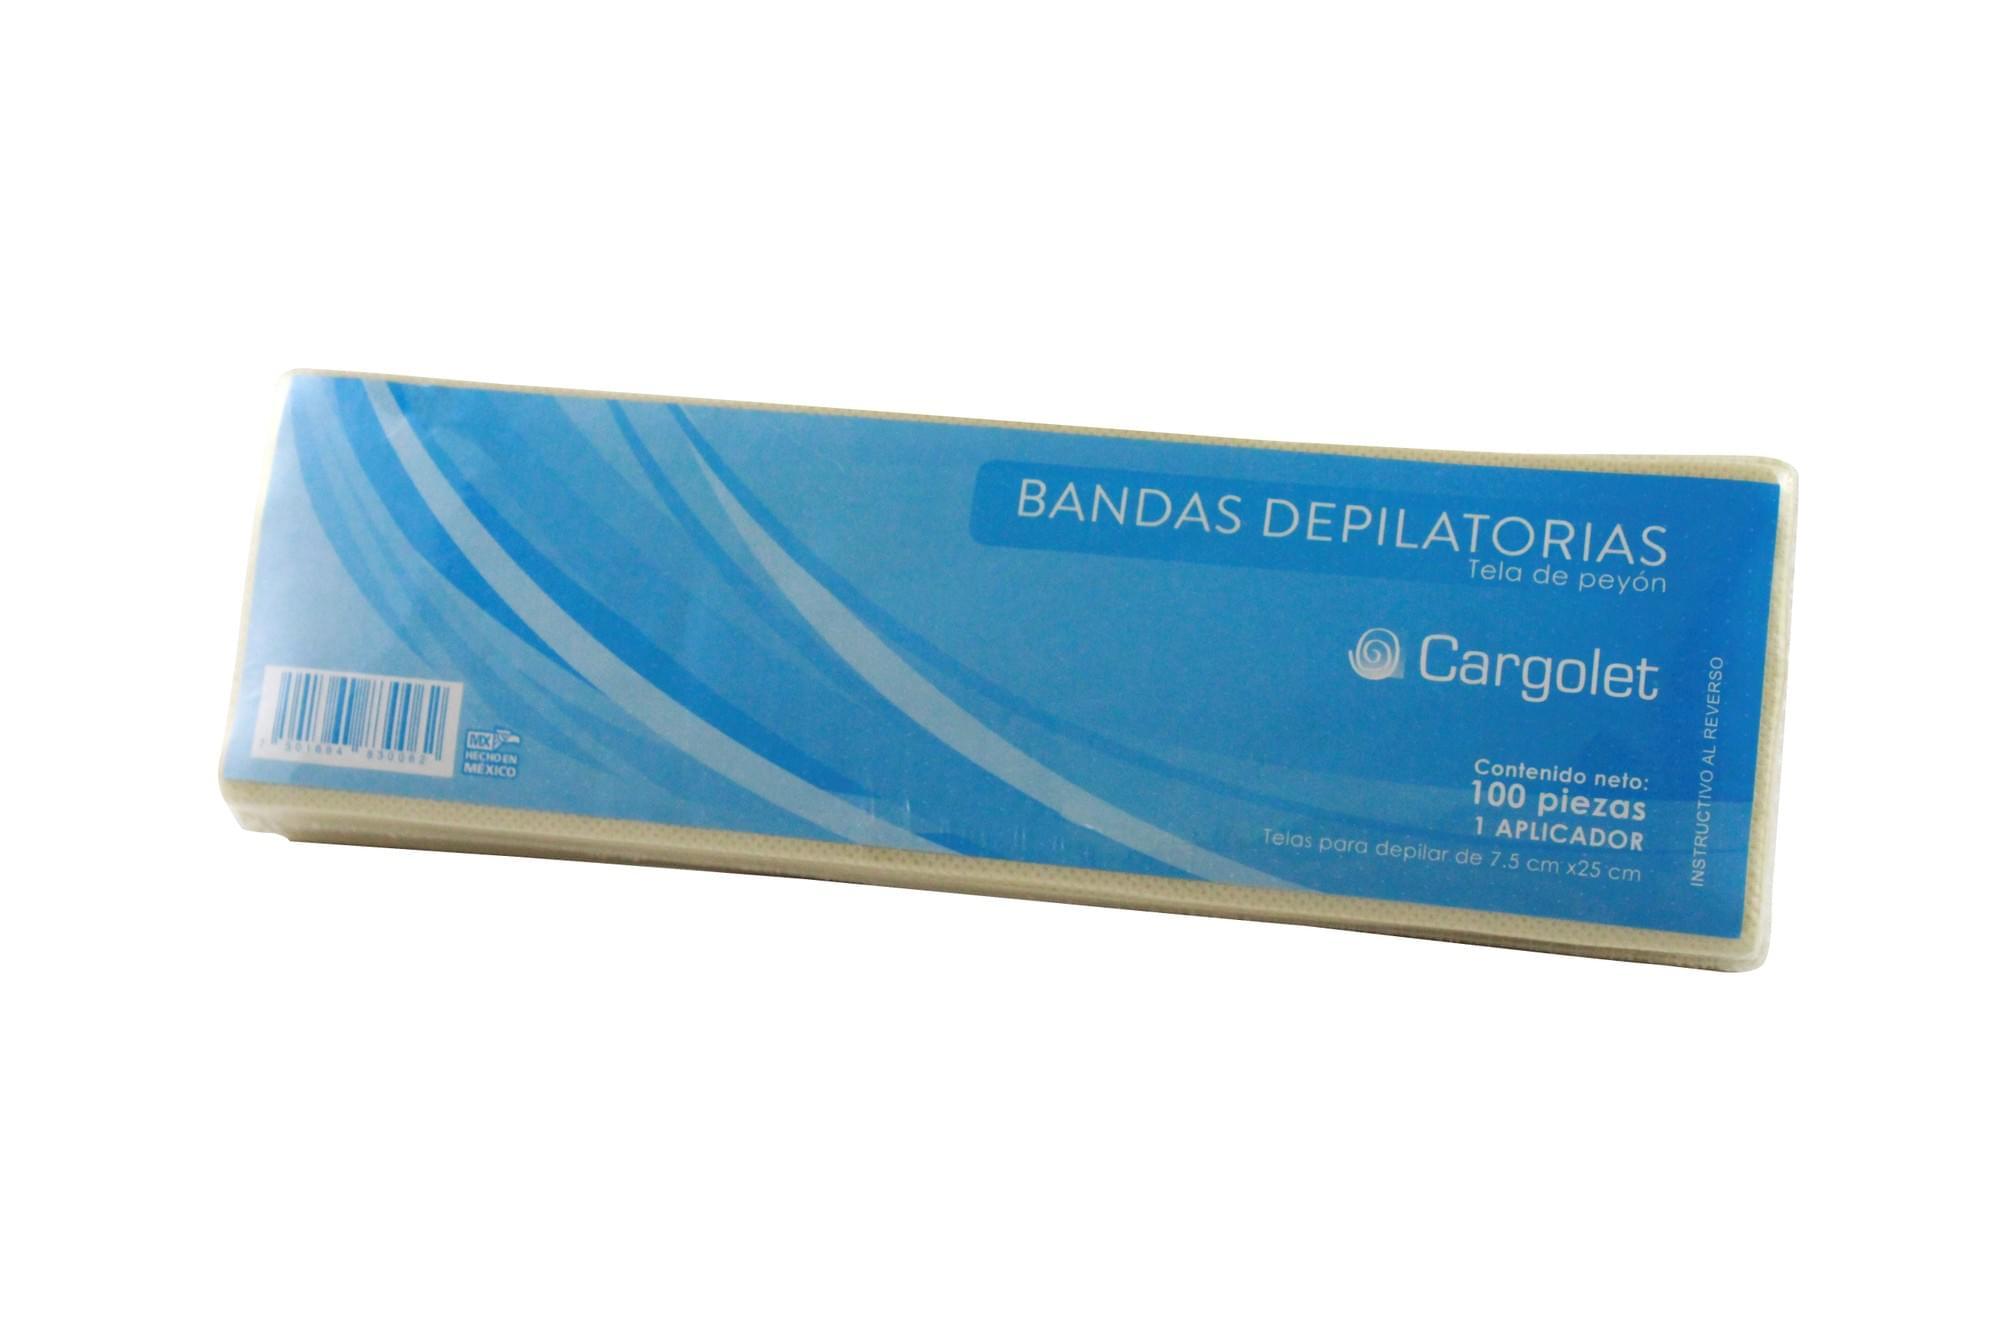 Bandas depilatorias 100 piezas